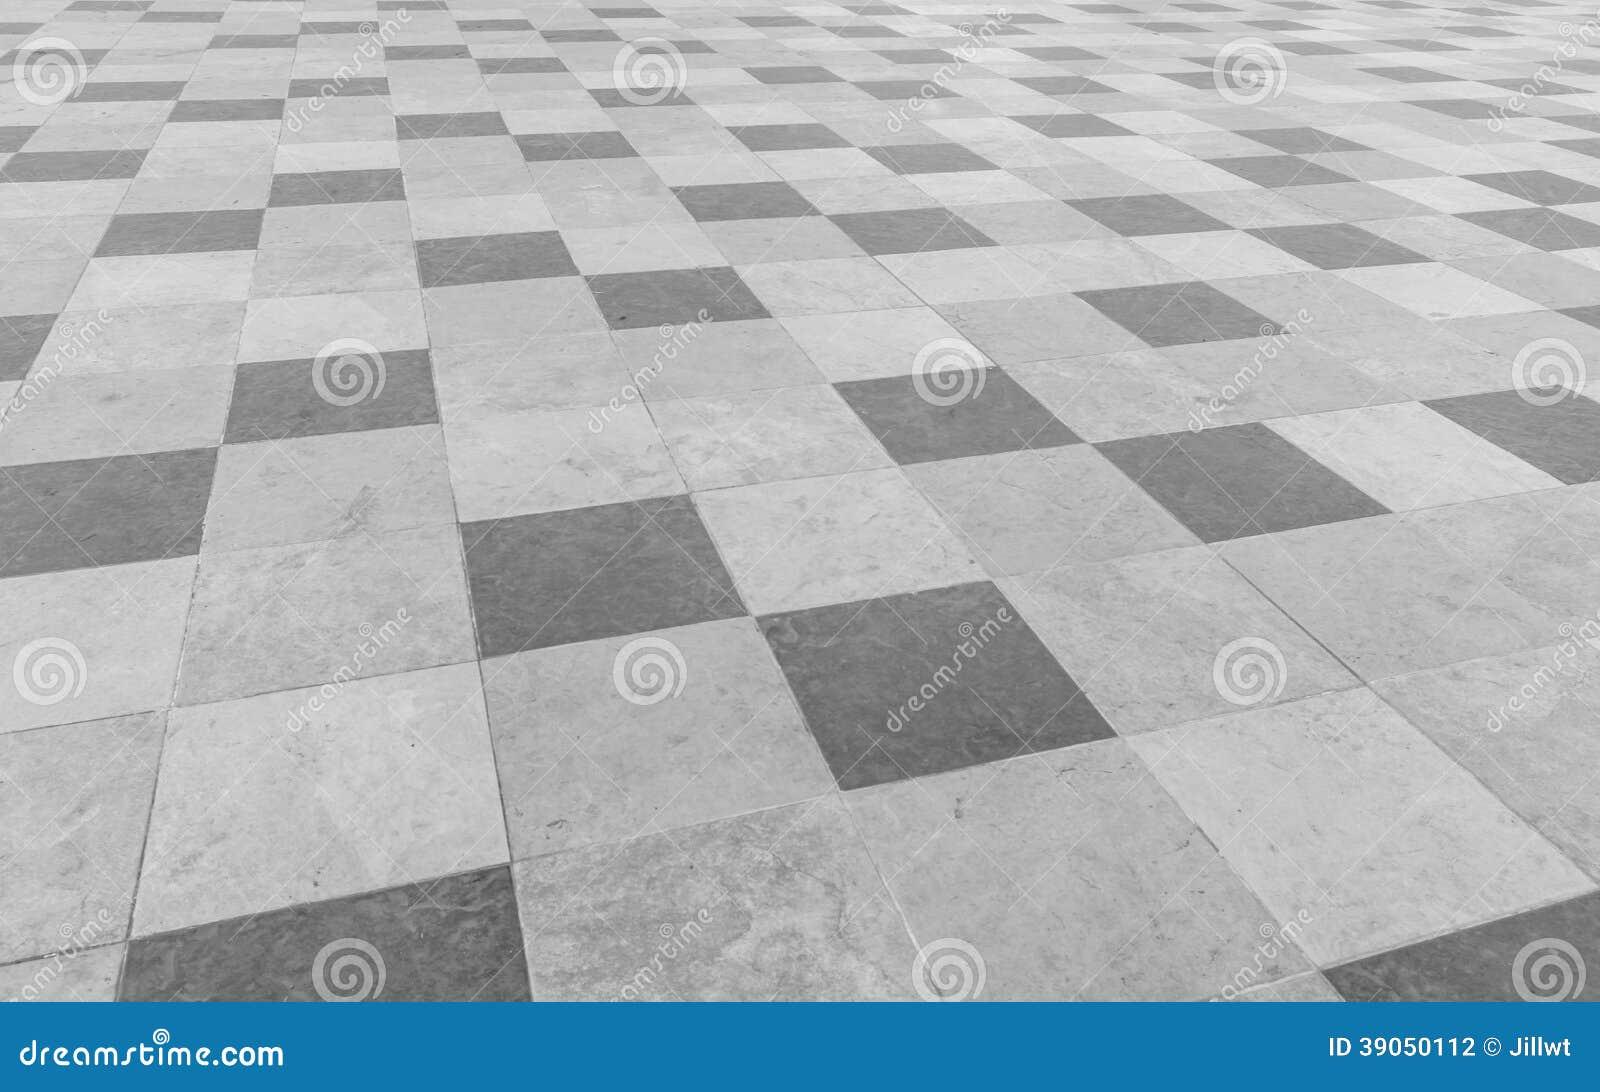 Square Pavement Tiles Stock Photo Image 39050112